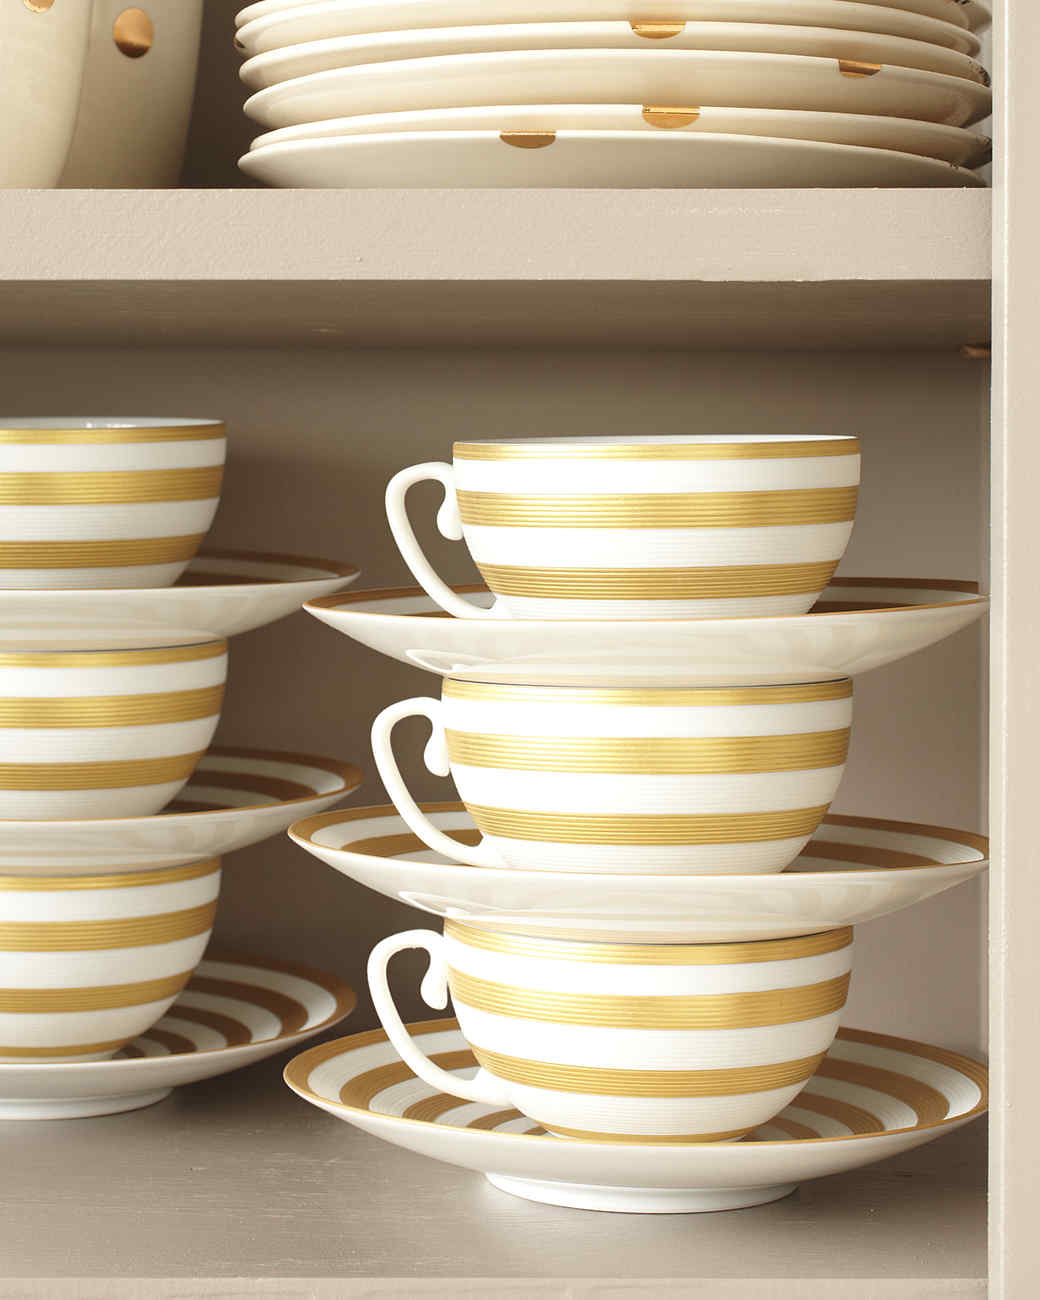 organized-teacups-saucer-0911mld107506.jpg